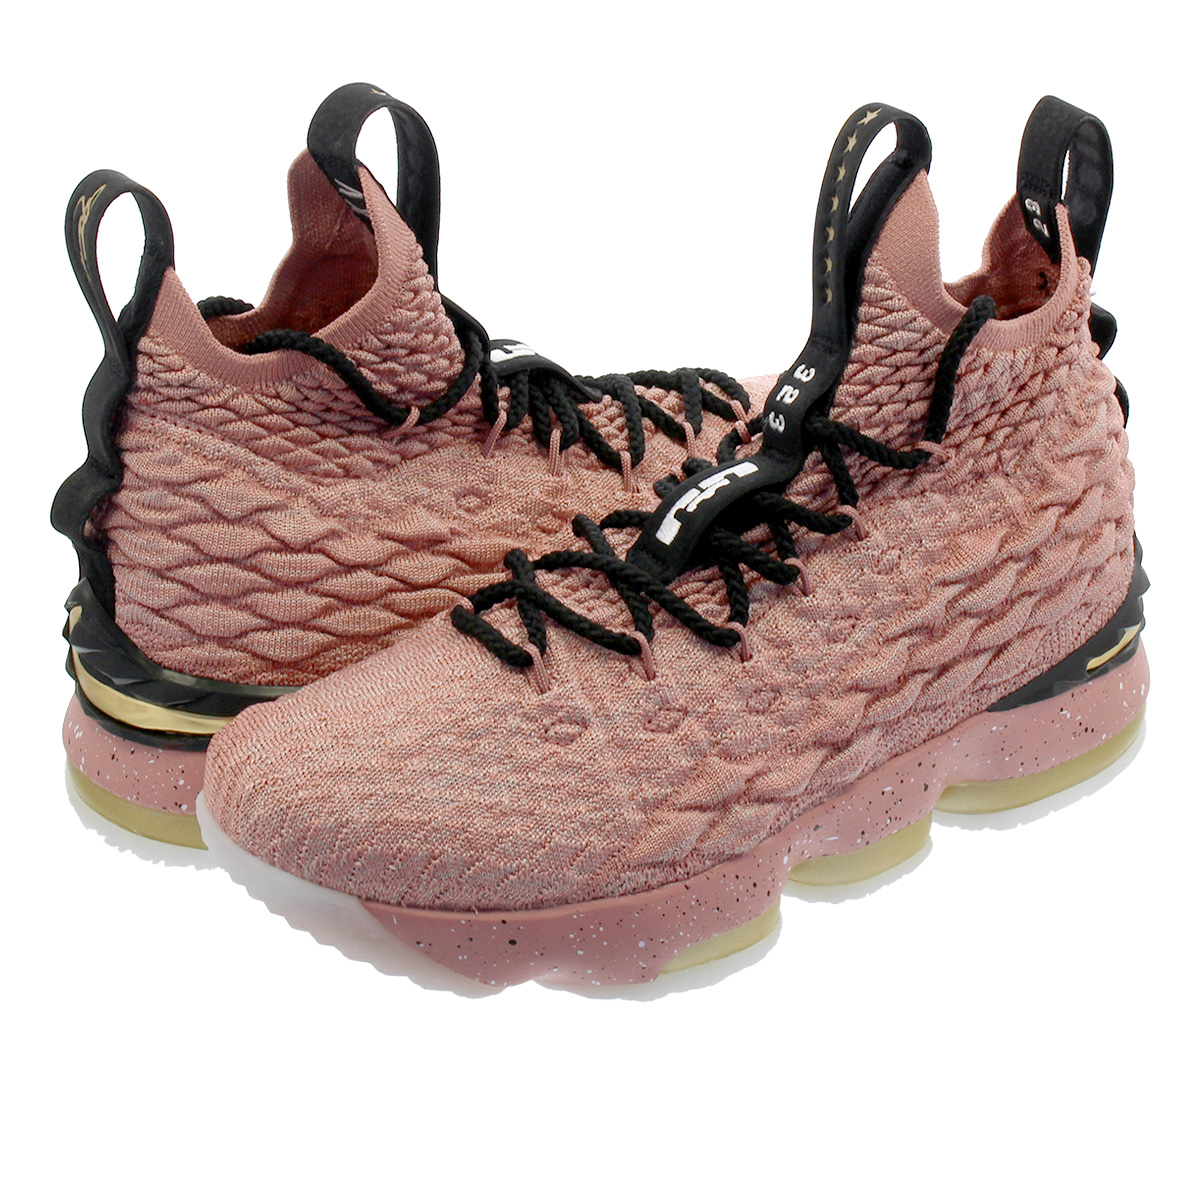 new style ff2ab 54535 NIKE LEBRON 15 GS Nike Revlon 15 GS RUST PINK/METALLIC GOLD/BLACK  943,762-600